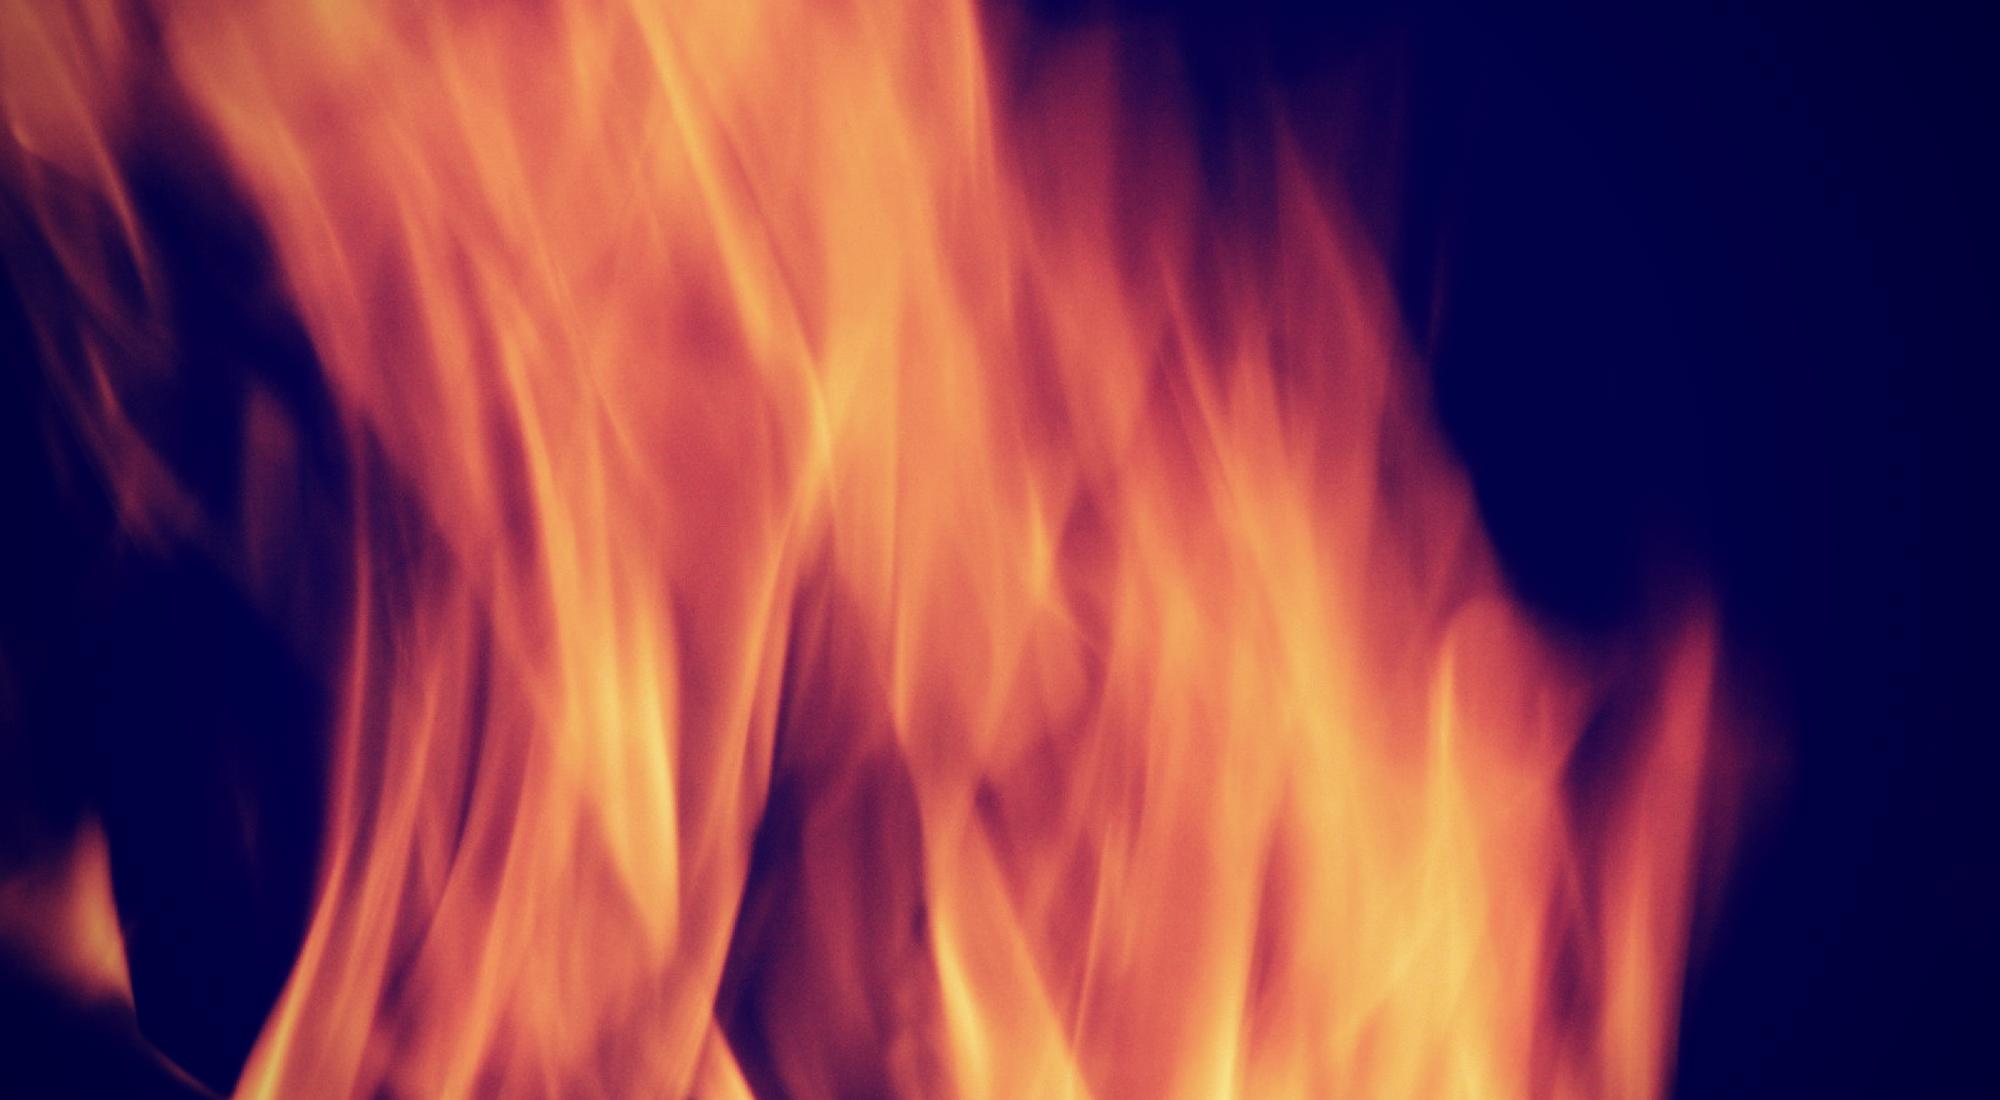 Flammabilitytesting